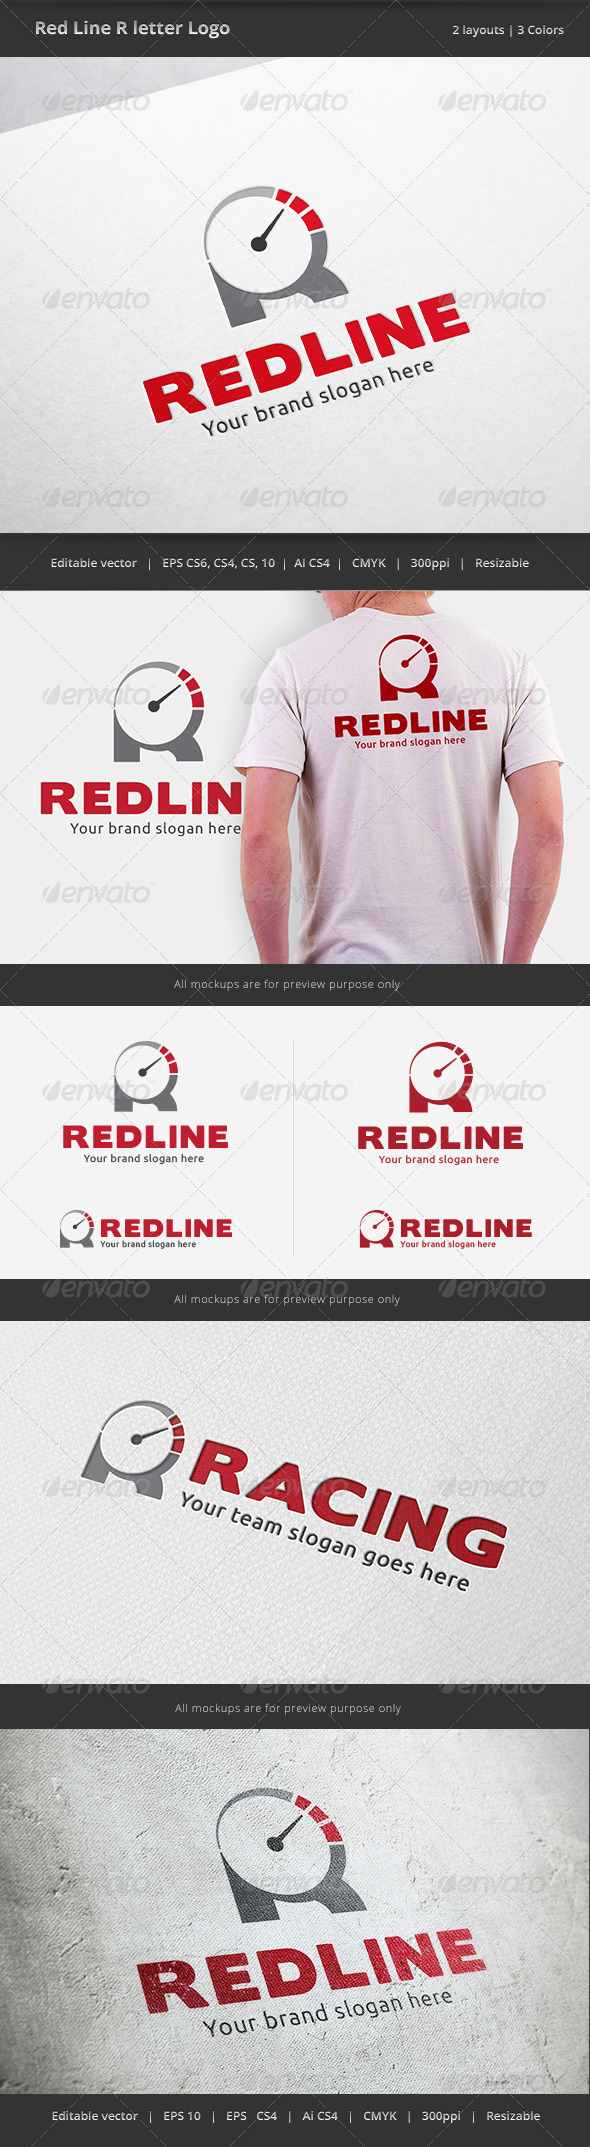 Red Line R Letter Logo - Letters Logo Templates